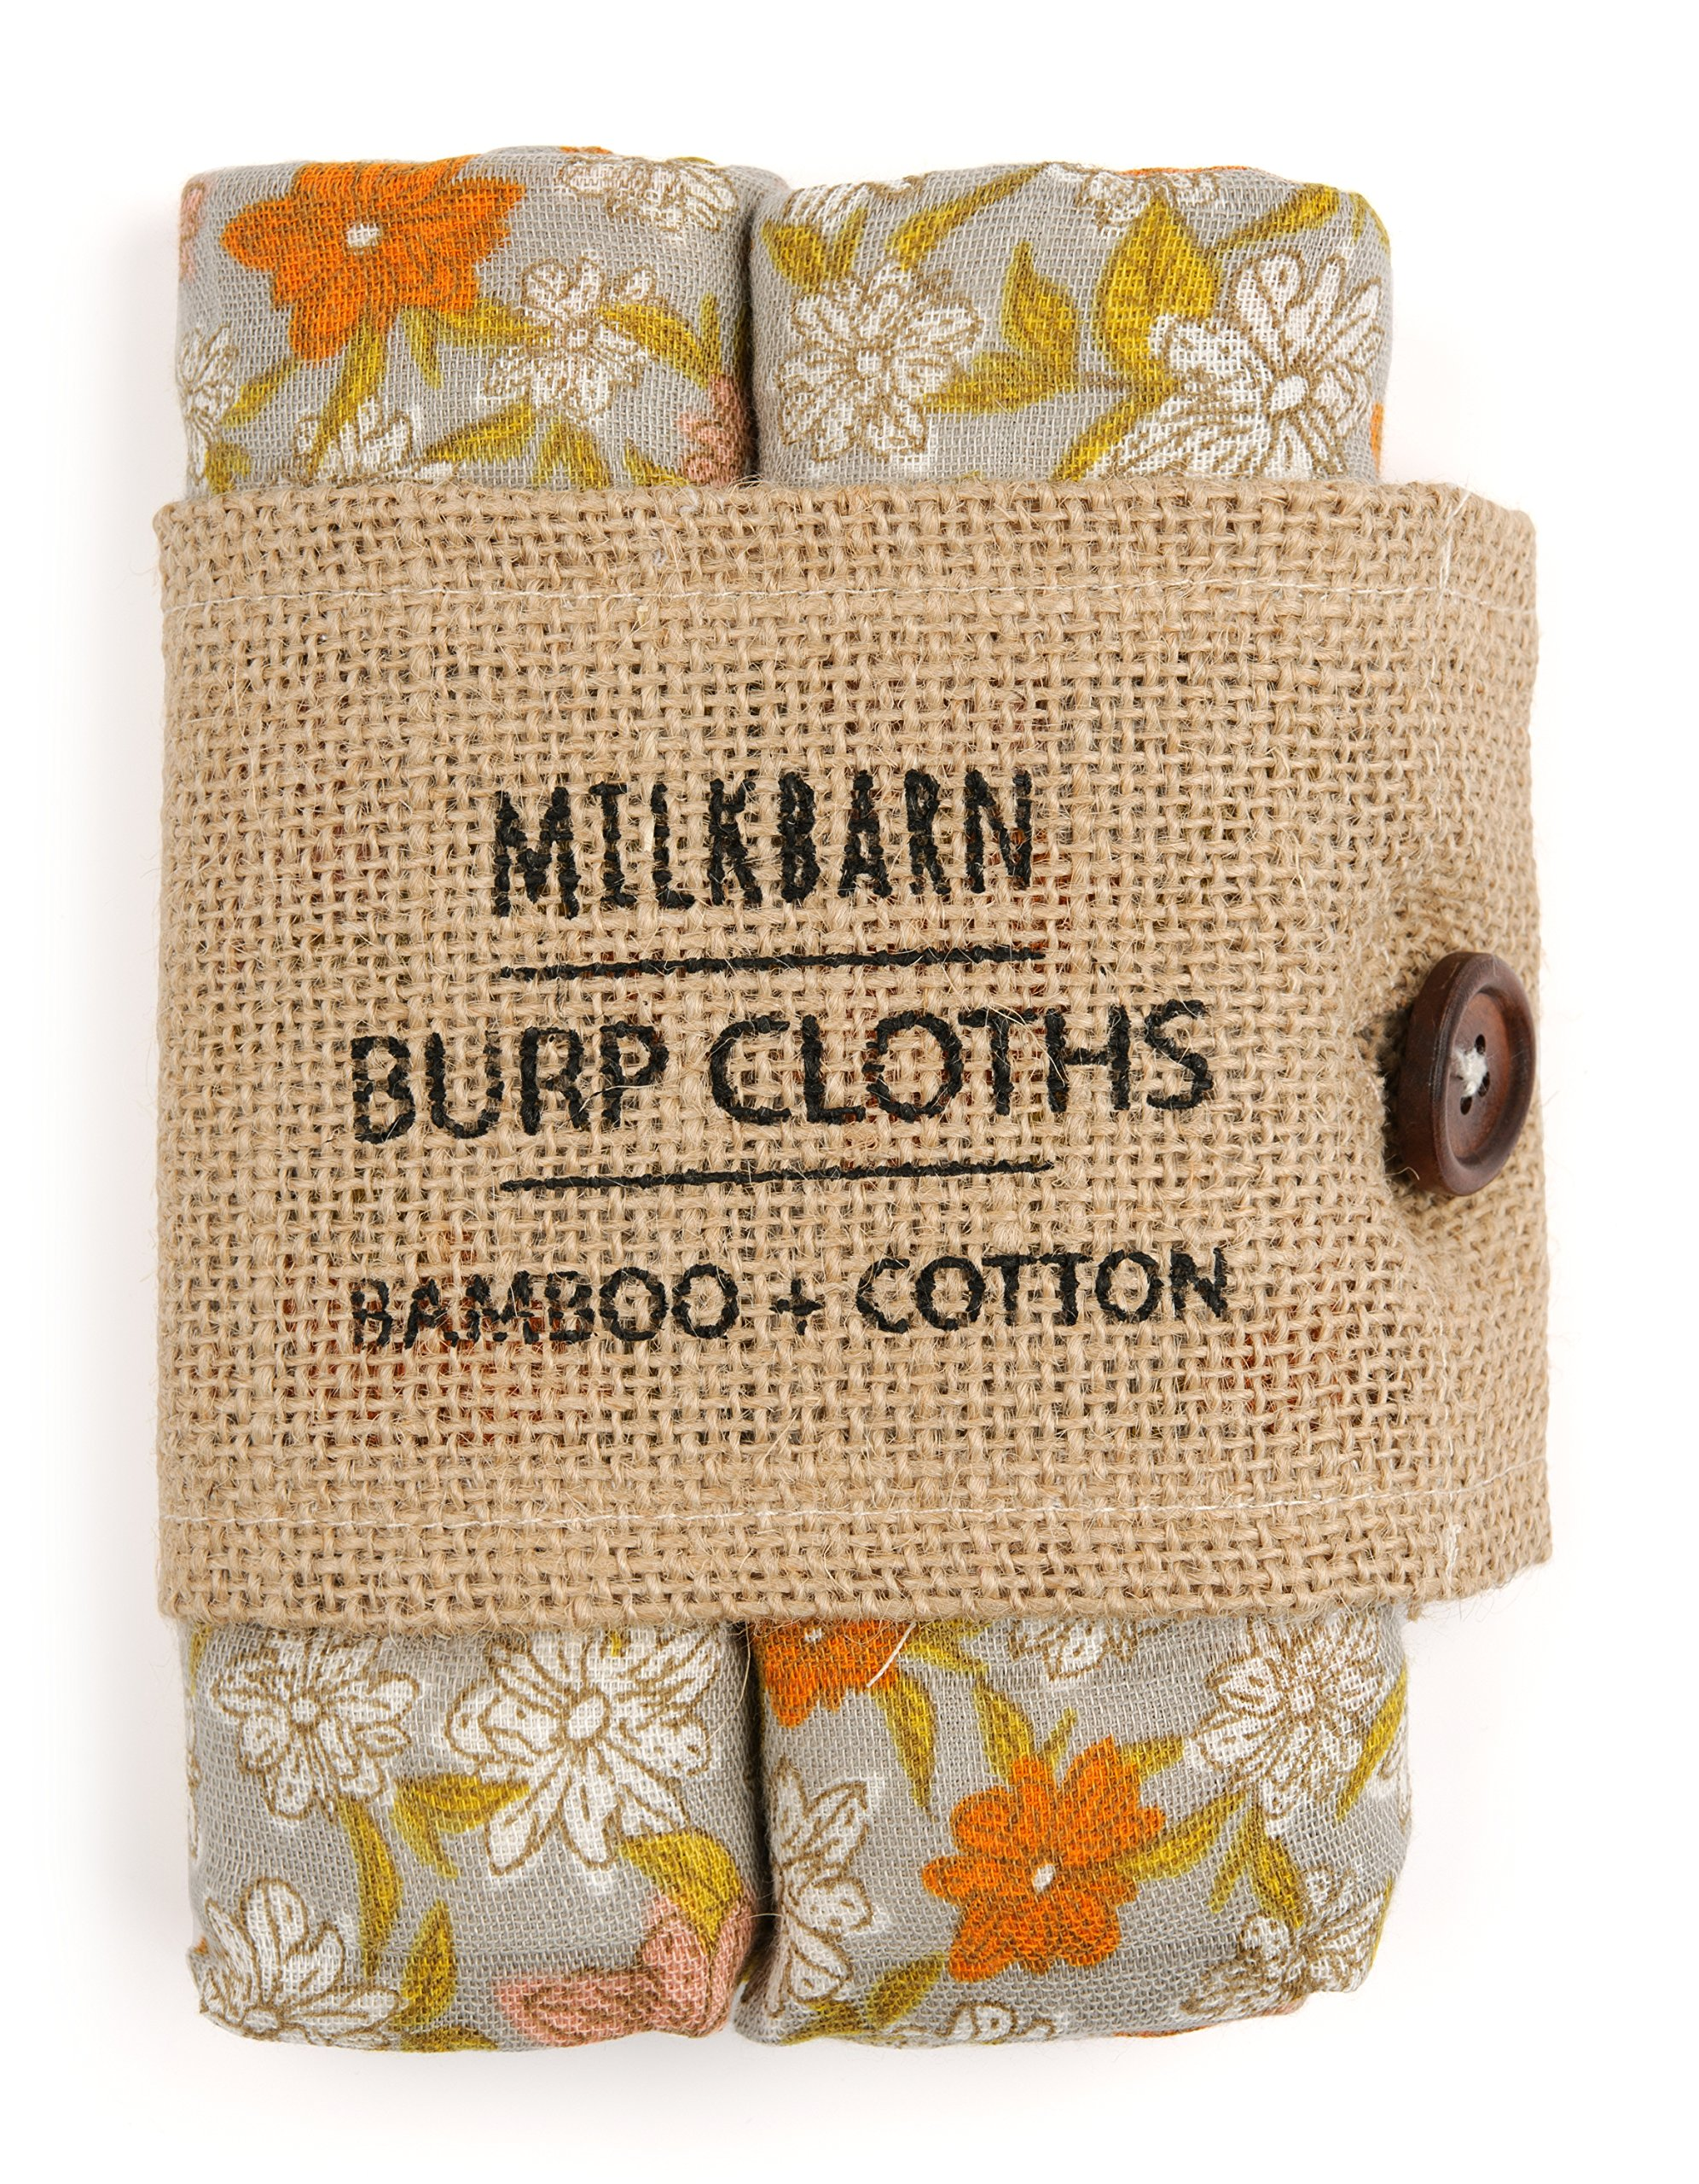 Milkbarn Bamboo Cotton burp Cloths (pack of 2)